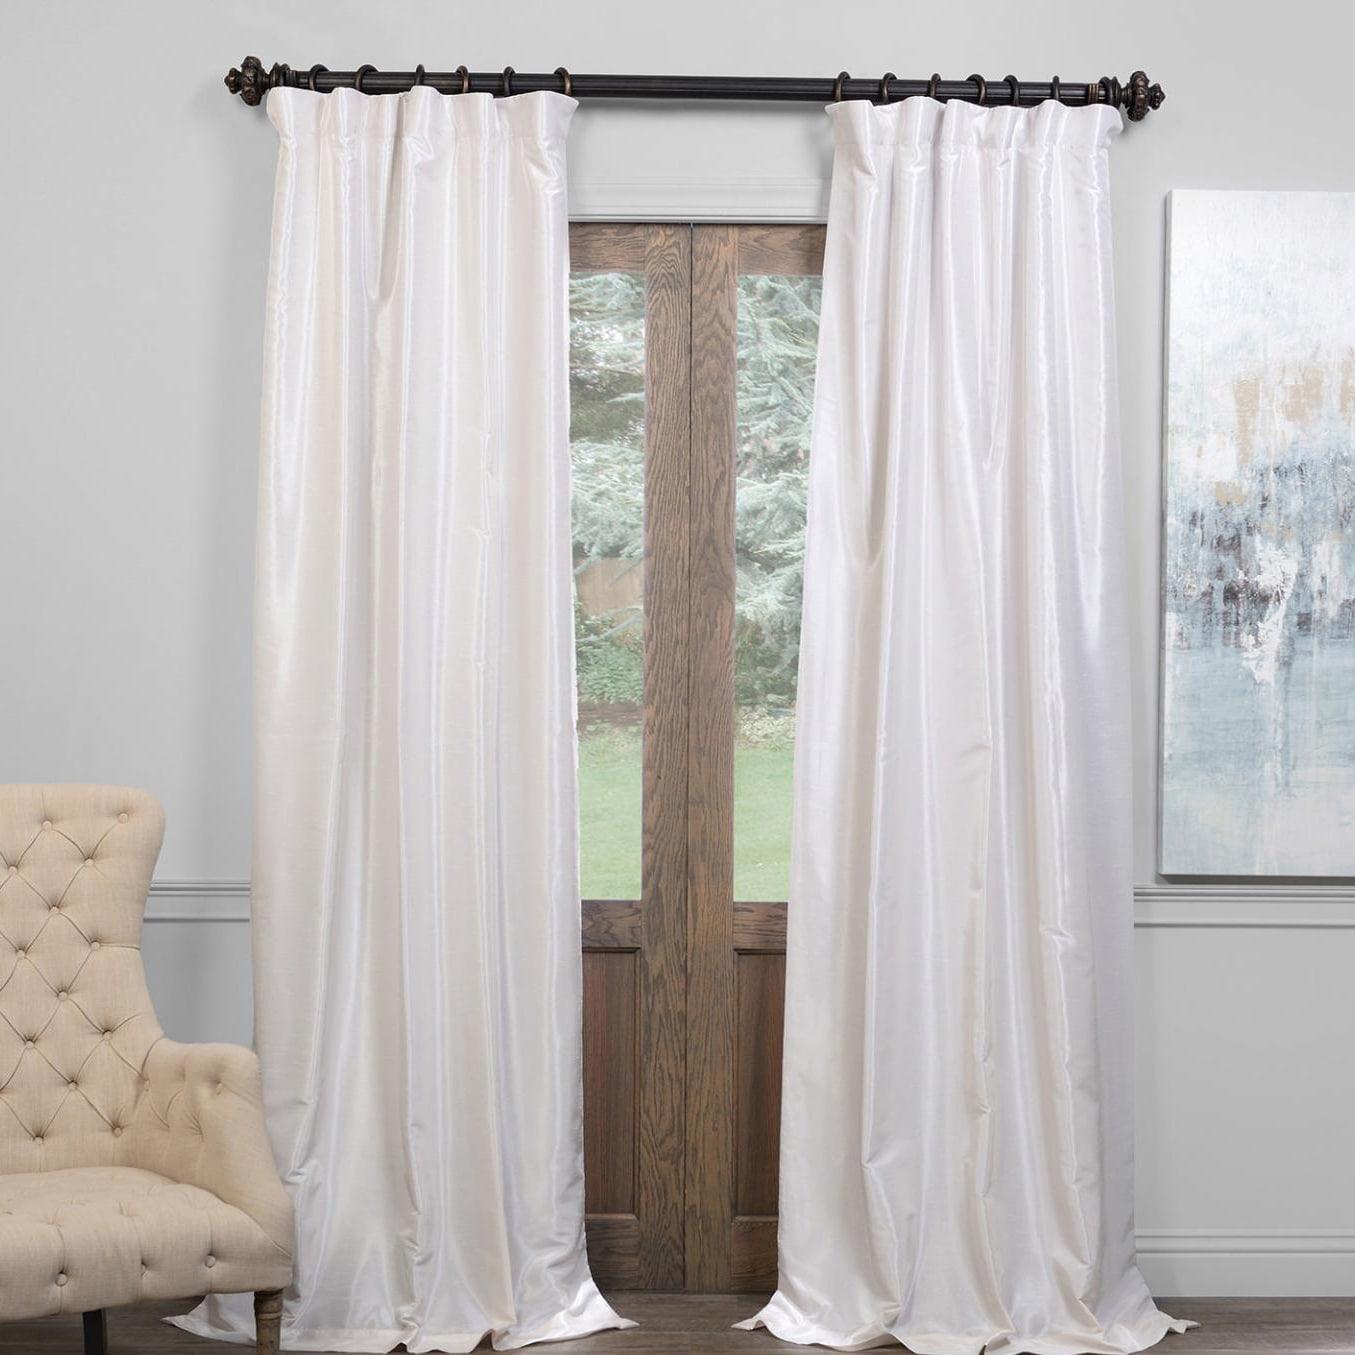 dupioni dis silk price curtain green half restful drapes curtains textured